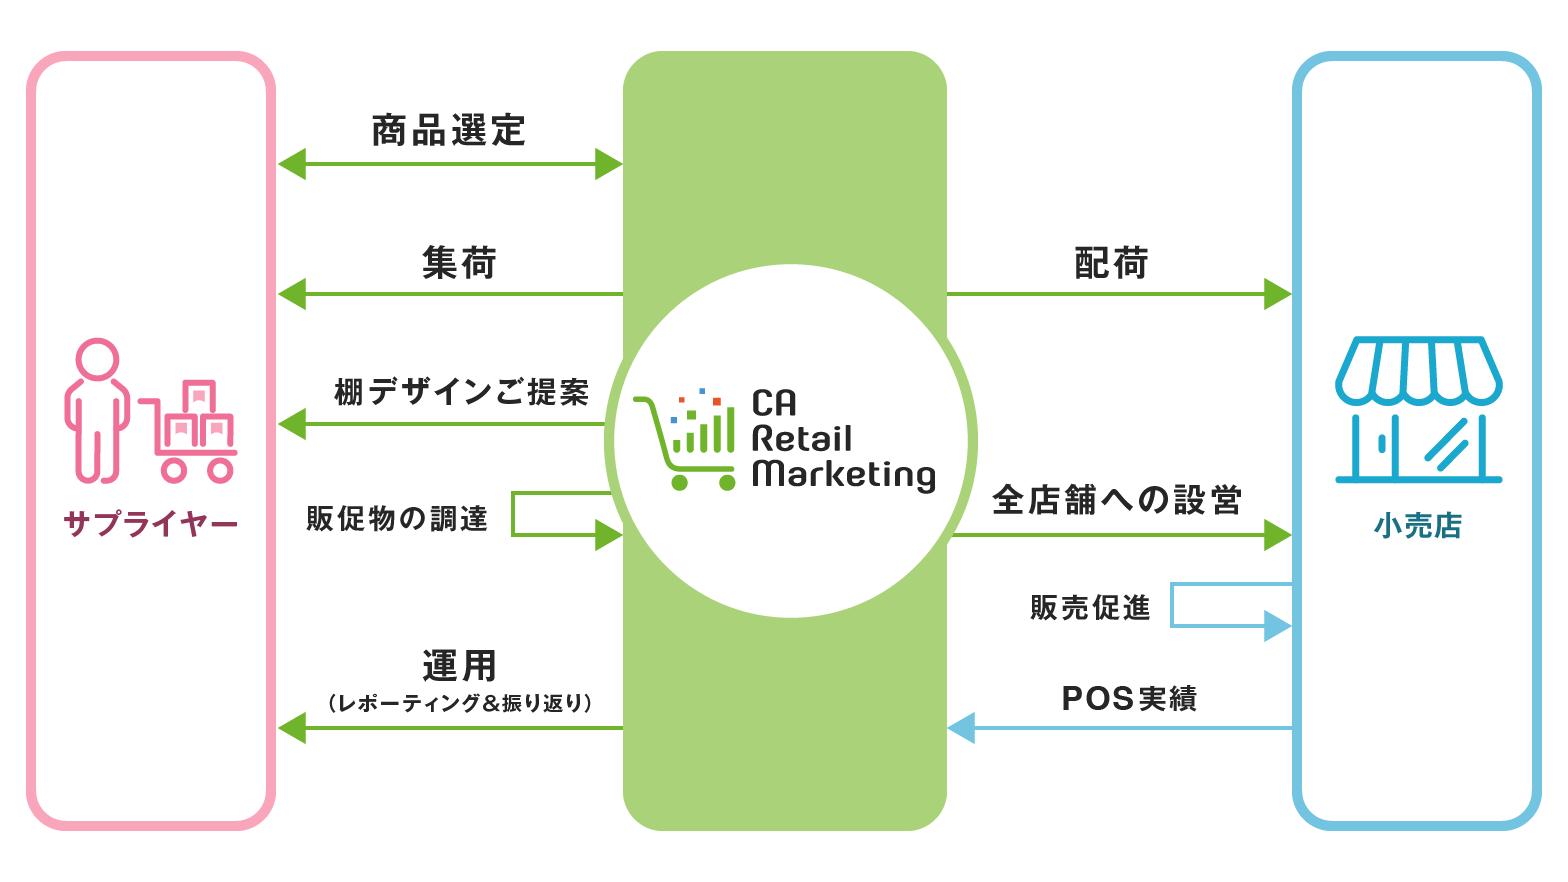 CA Retail Marketing